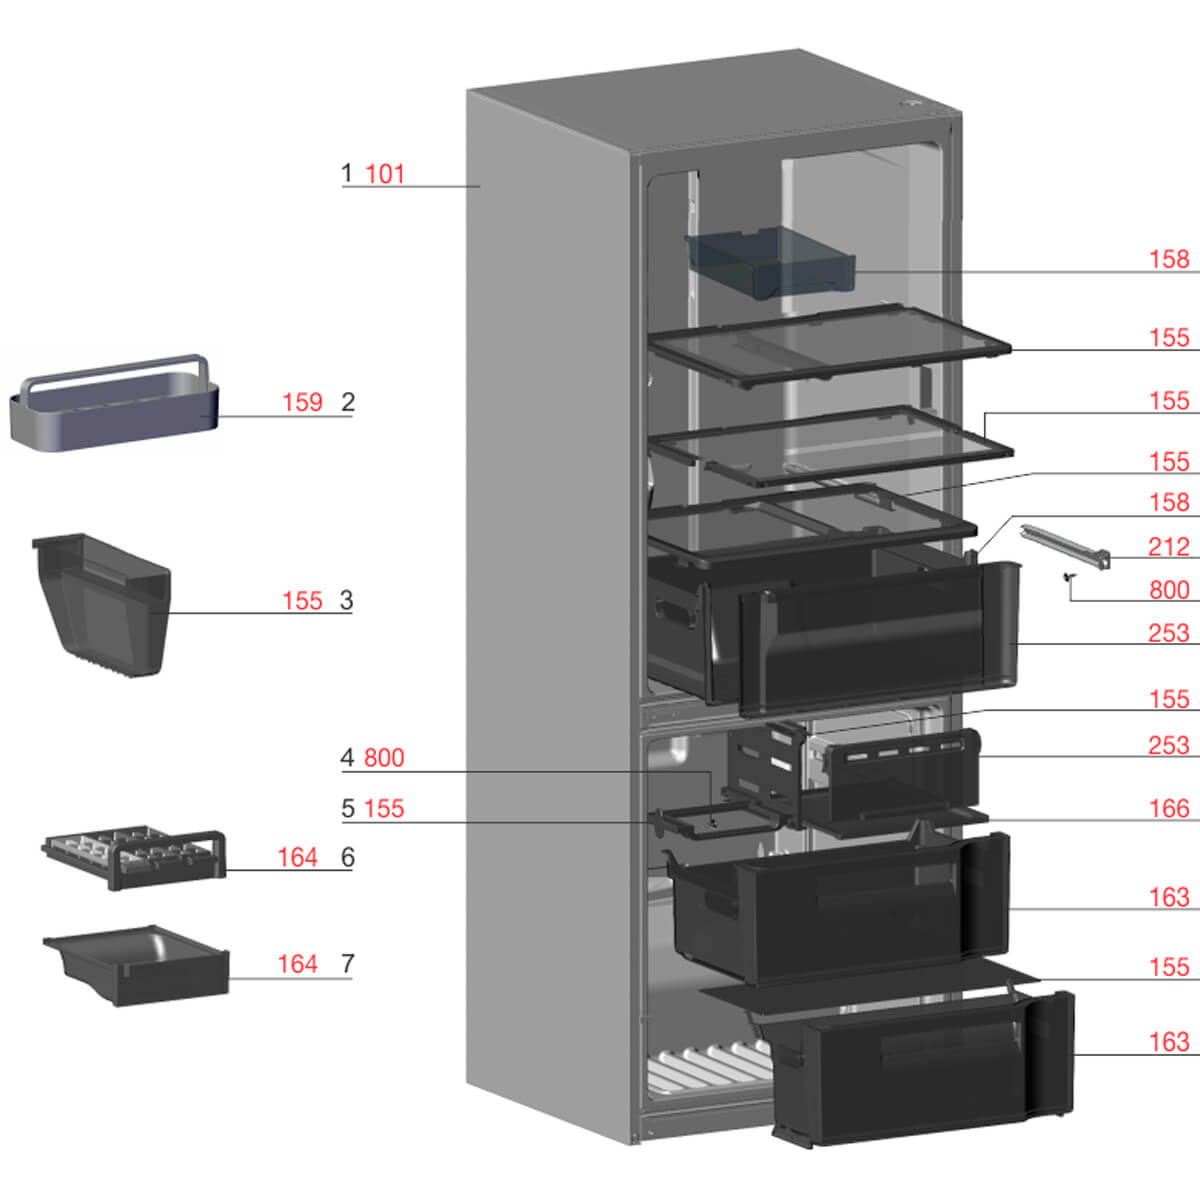 Prateleira Retrátil Para Refrigerador Electrolux DB53 DB53X DB52 DB52X - 70002895